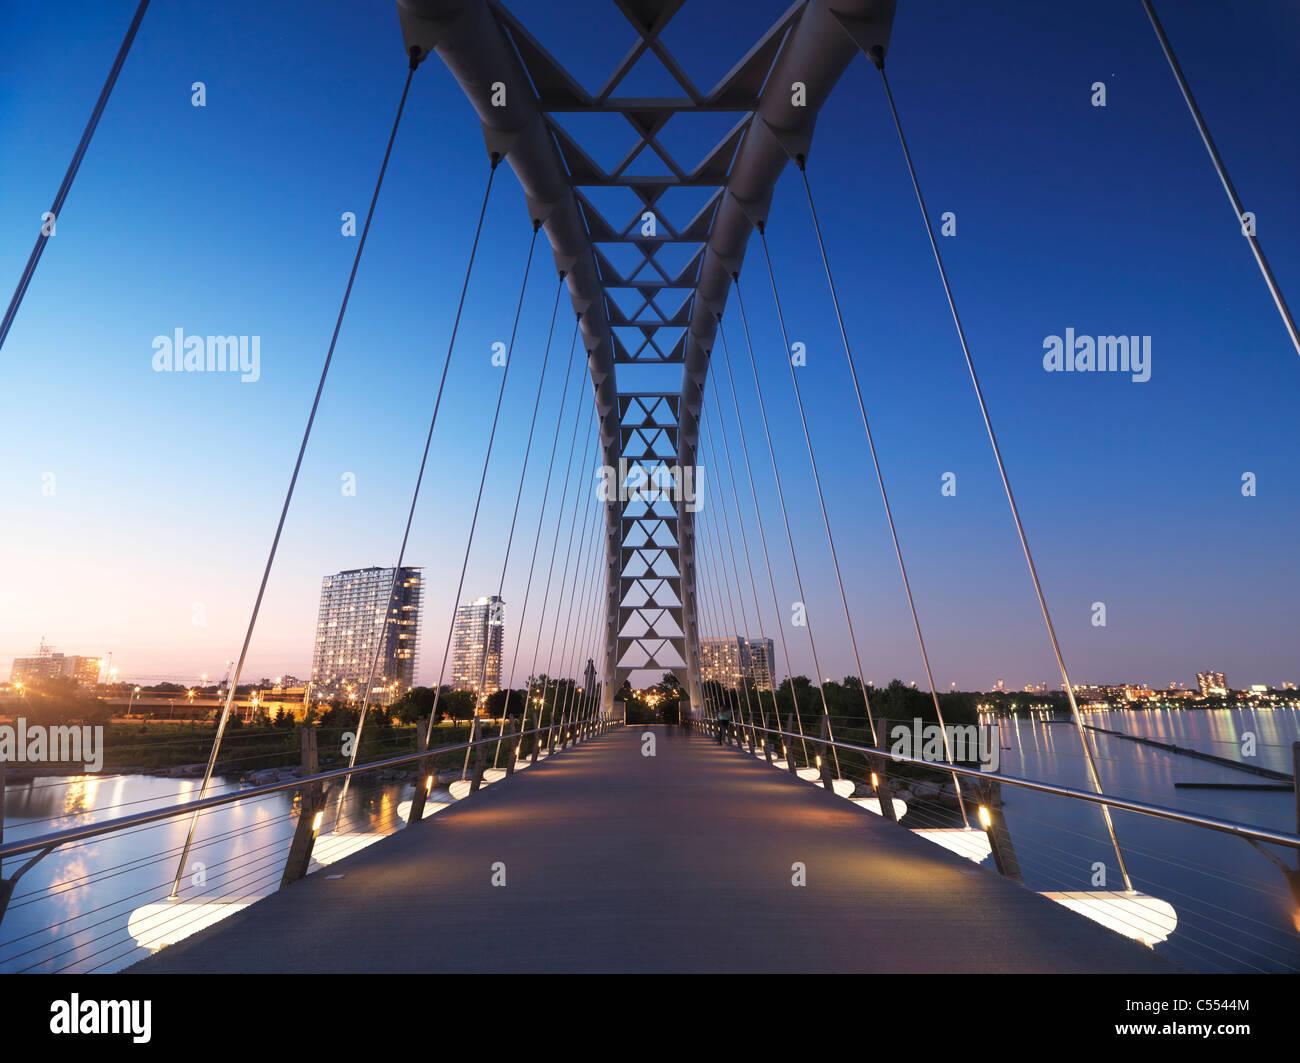 The Humber River Arch Bridge in Toronto during sunset also known as the Humber Bay Arch Bridge or the Gateway Bridge. Canada Stock Photo